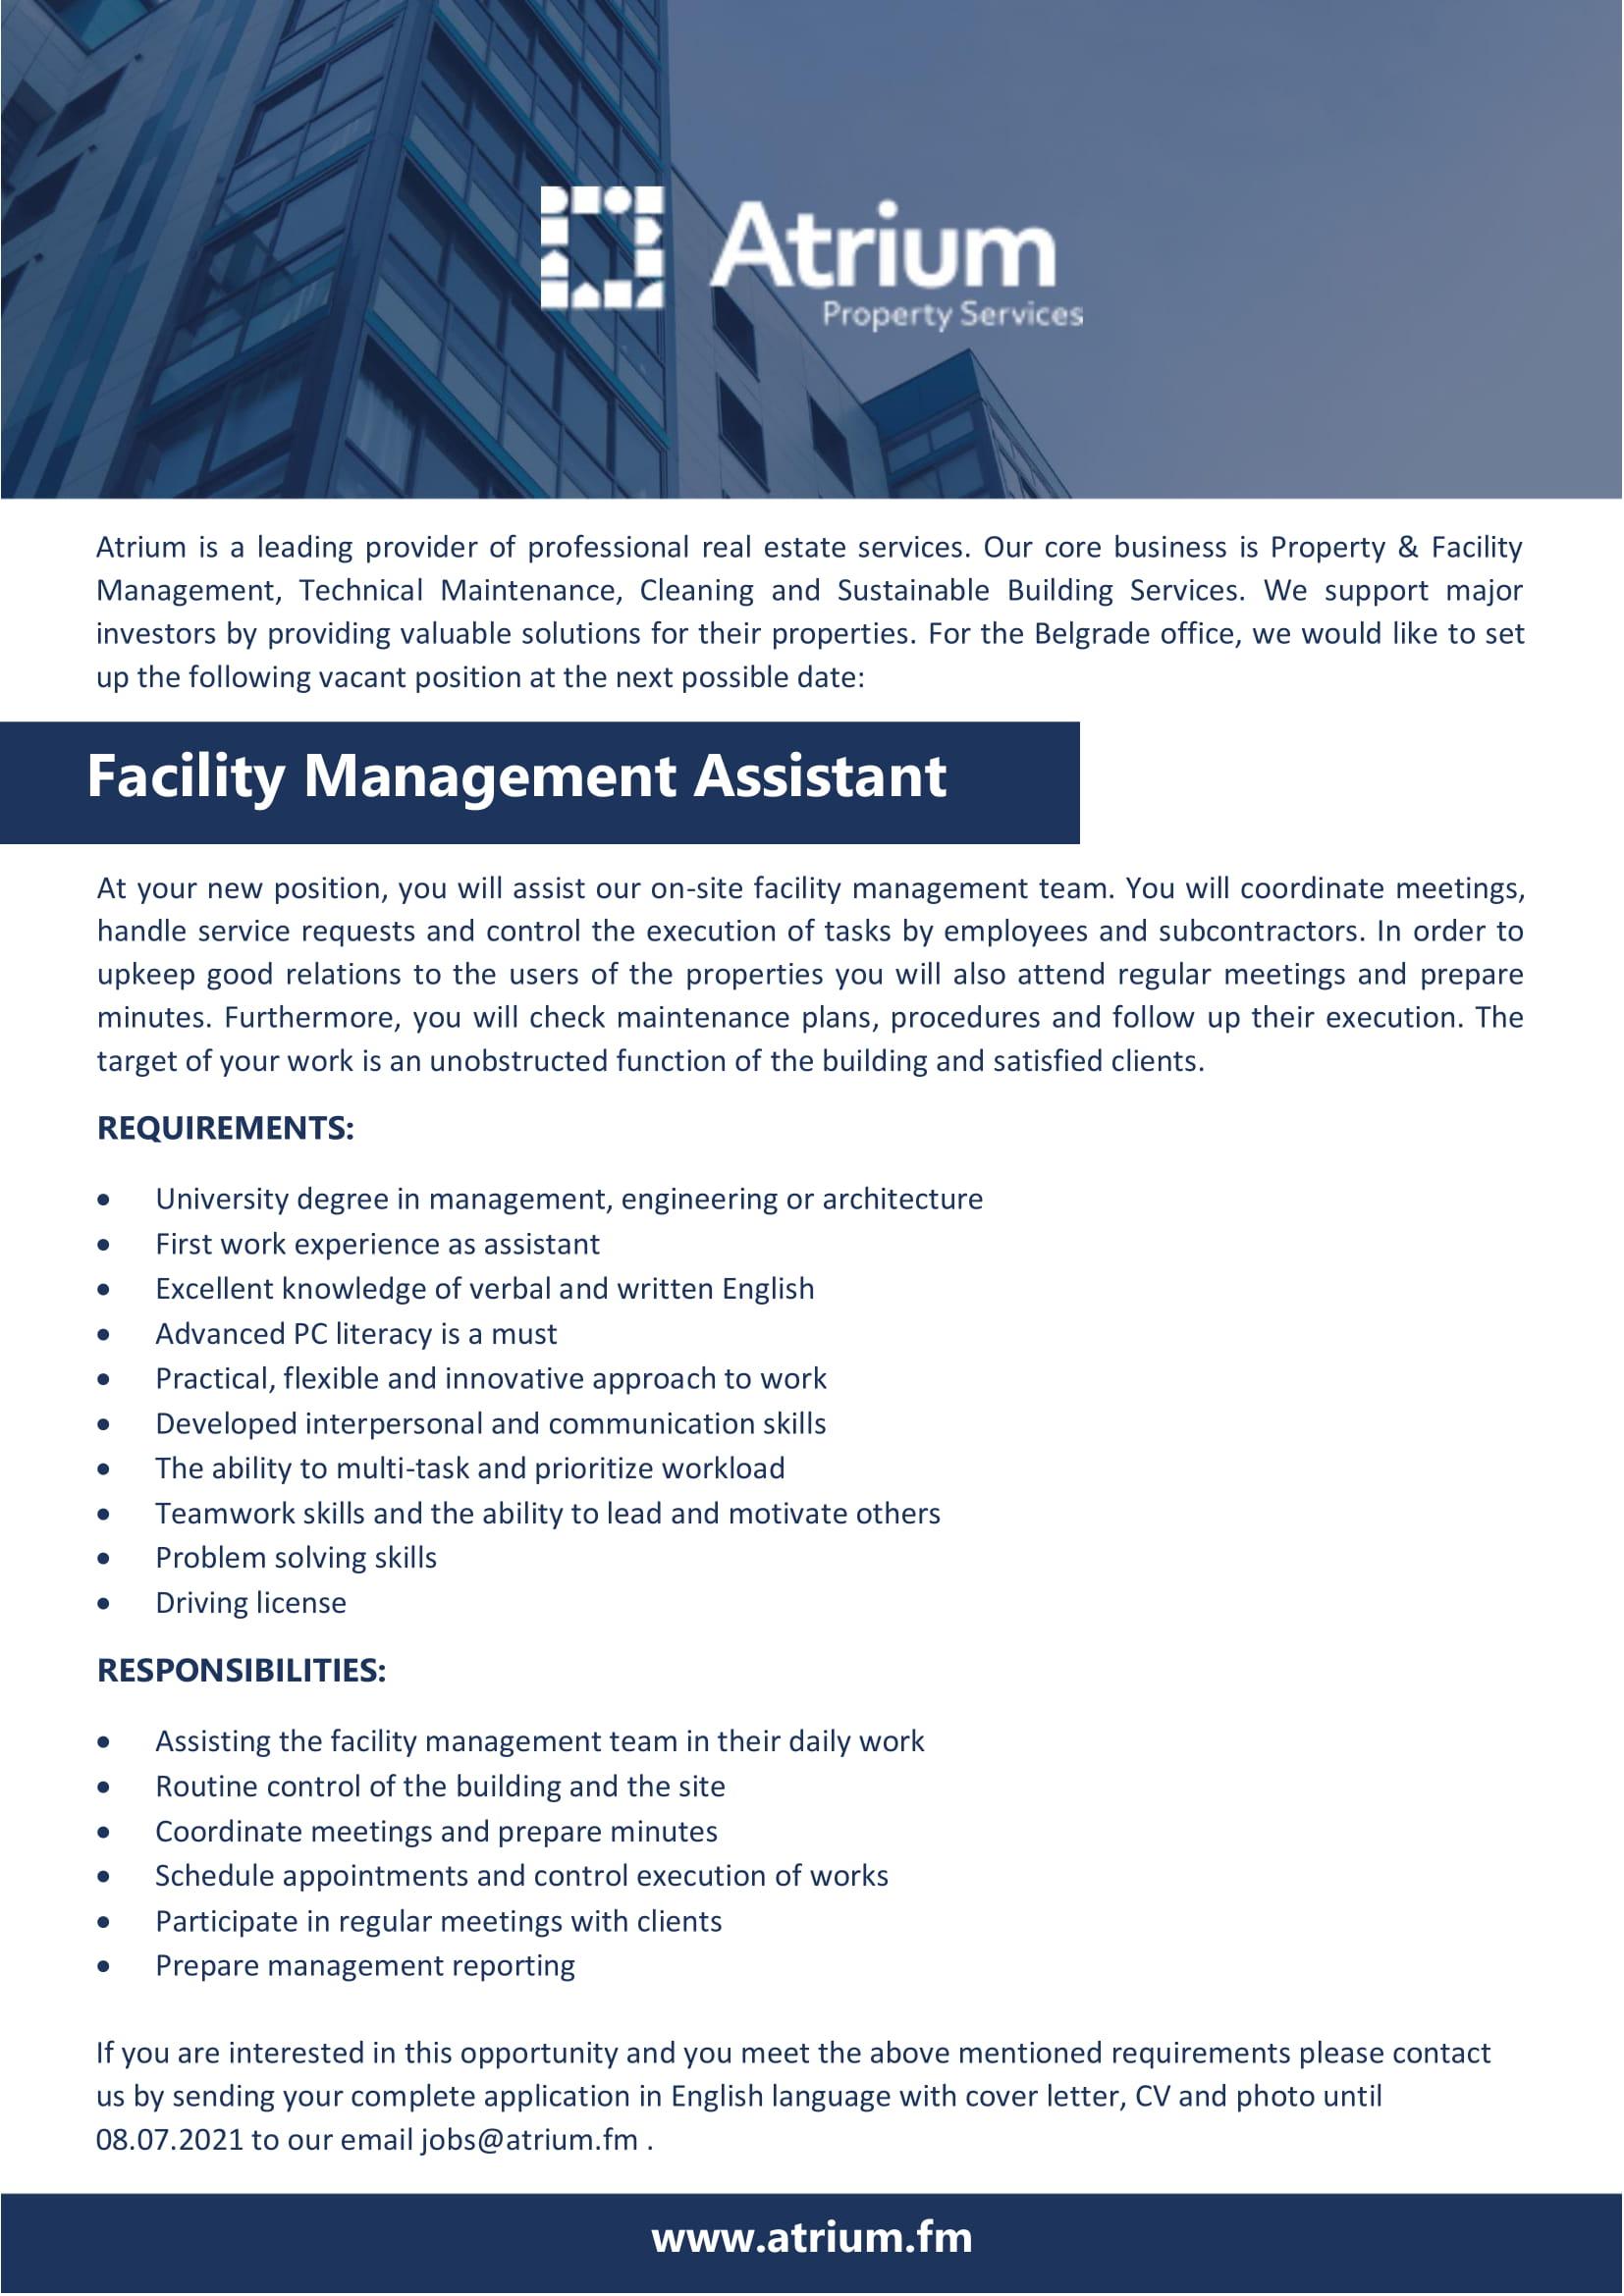 Facility Management Assistant